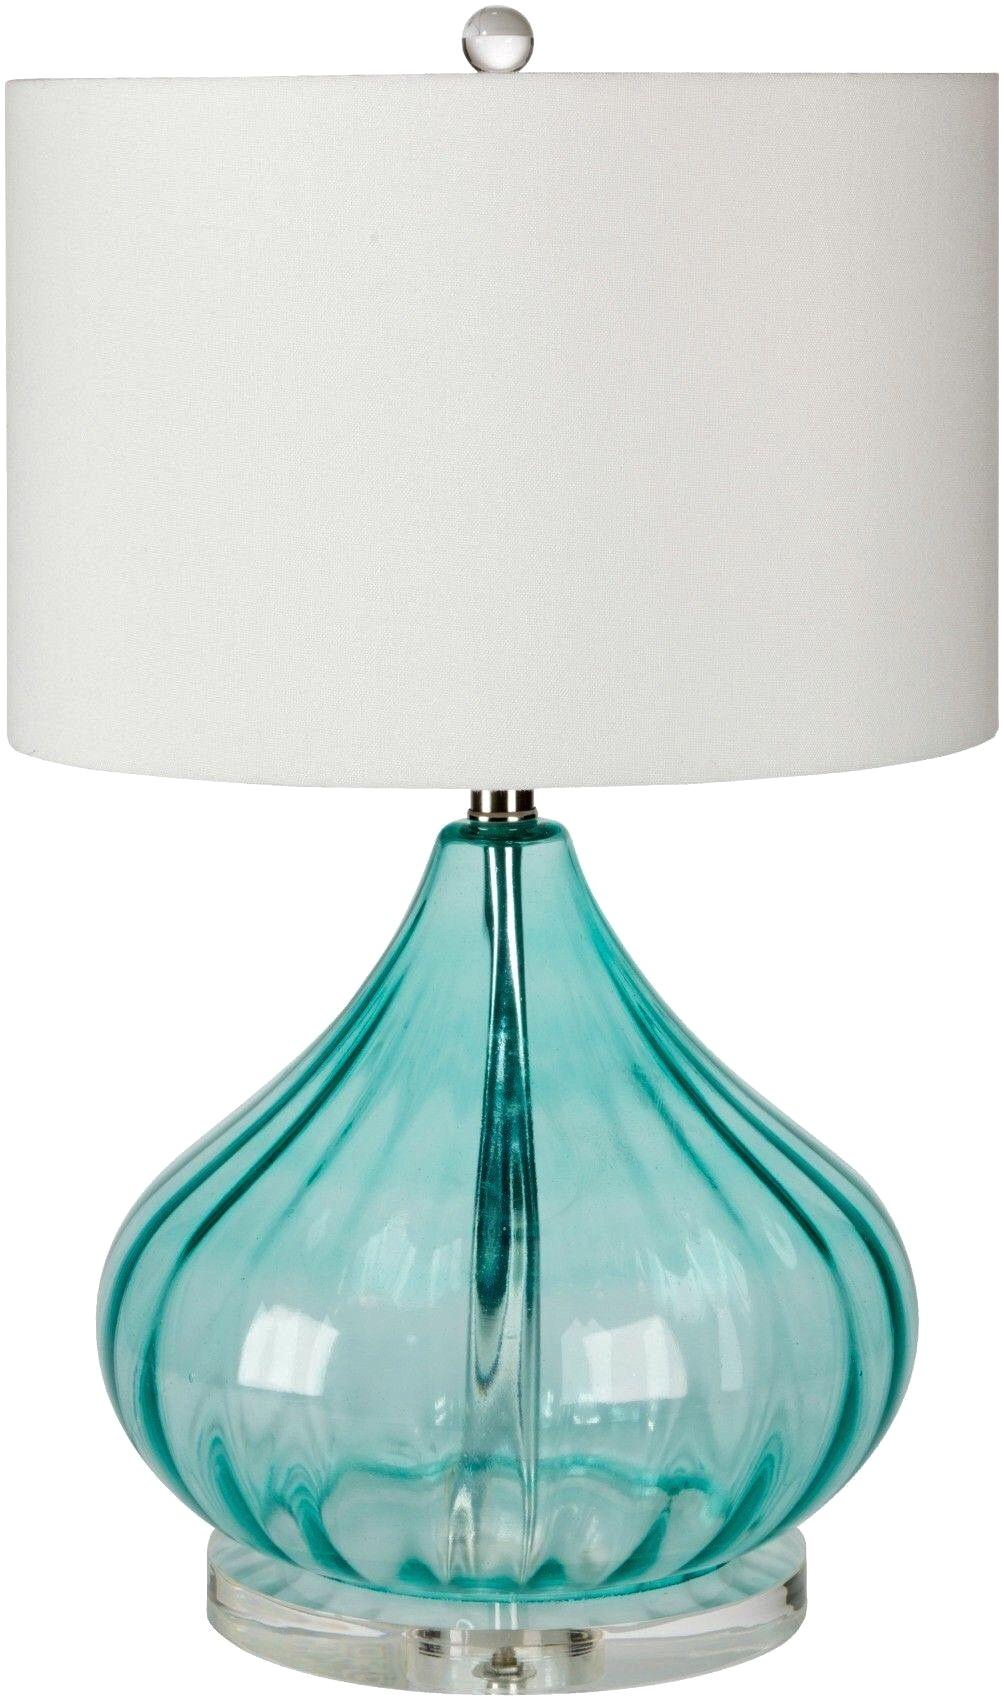 Beach themed Lamp Shades Coastal Lamp Beachin Pinterest Coastal Aqua Glass and Aqua